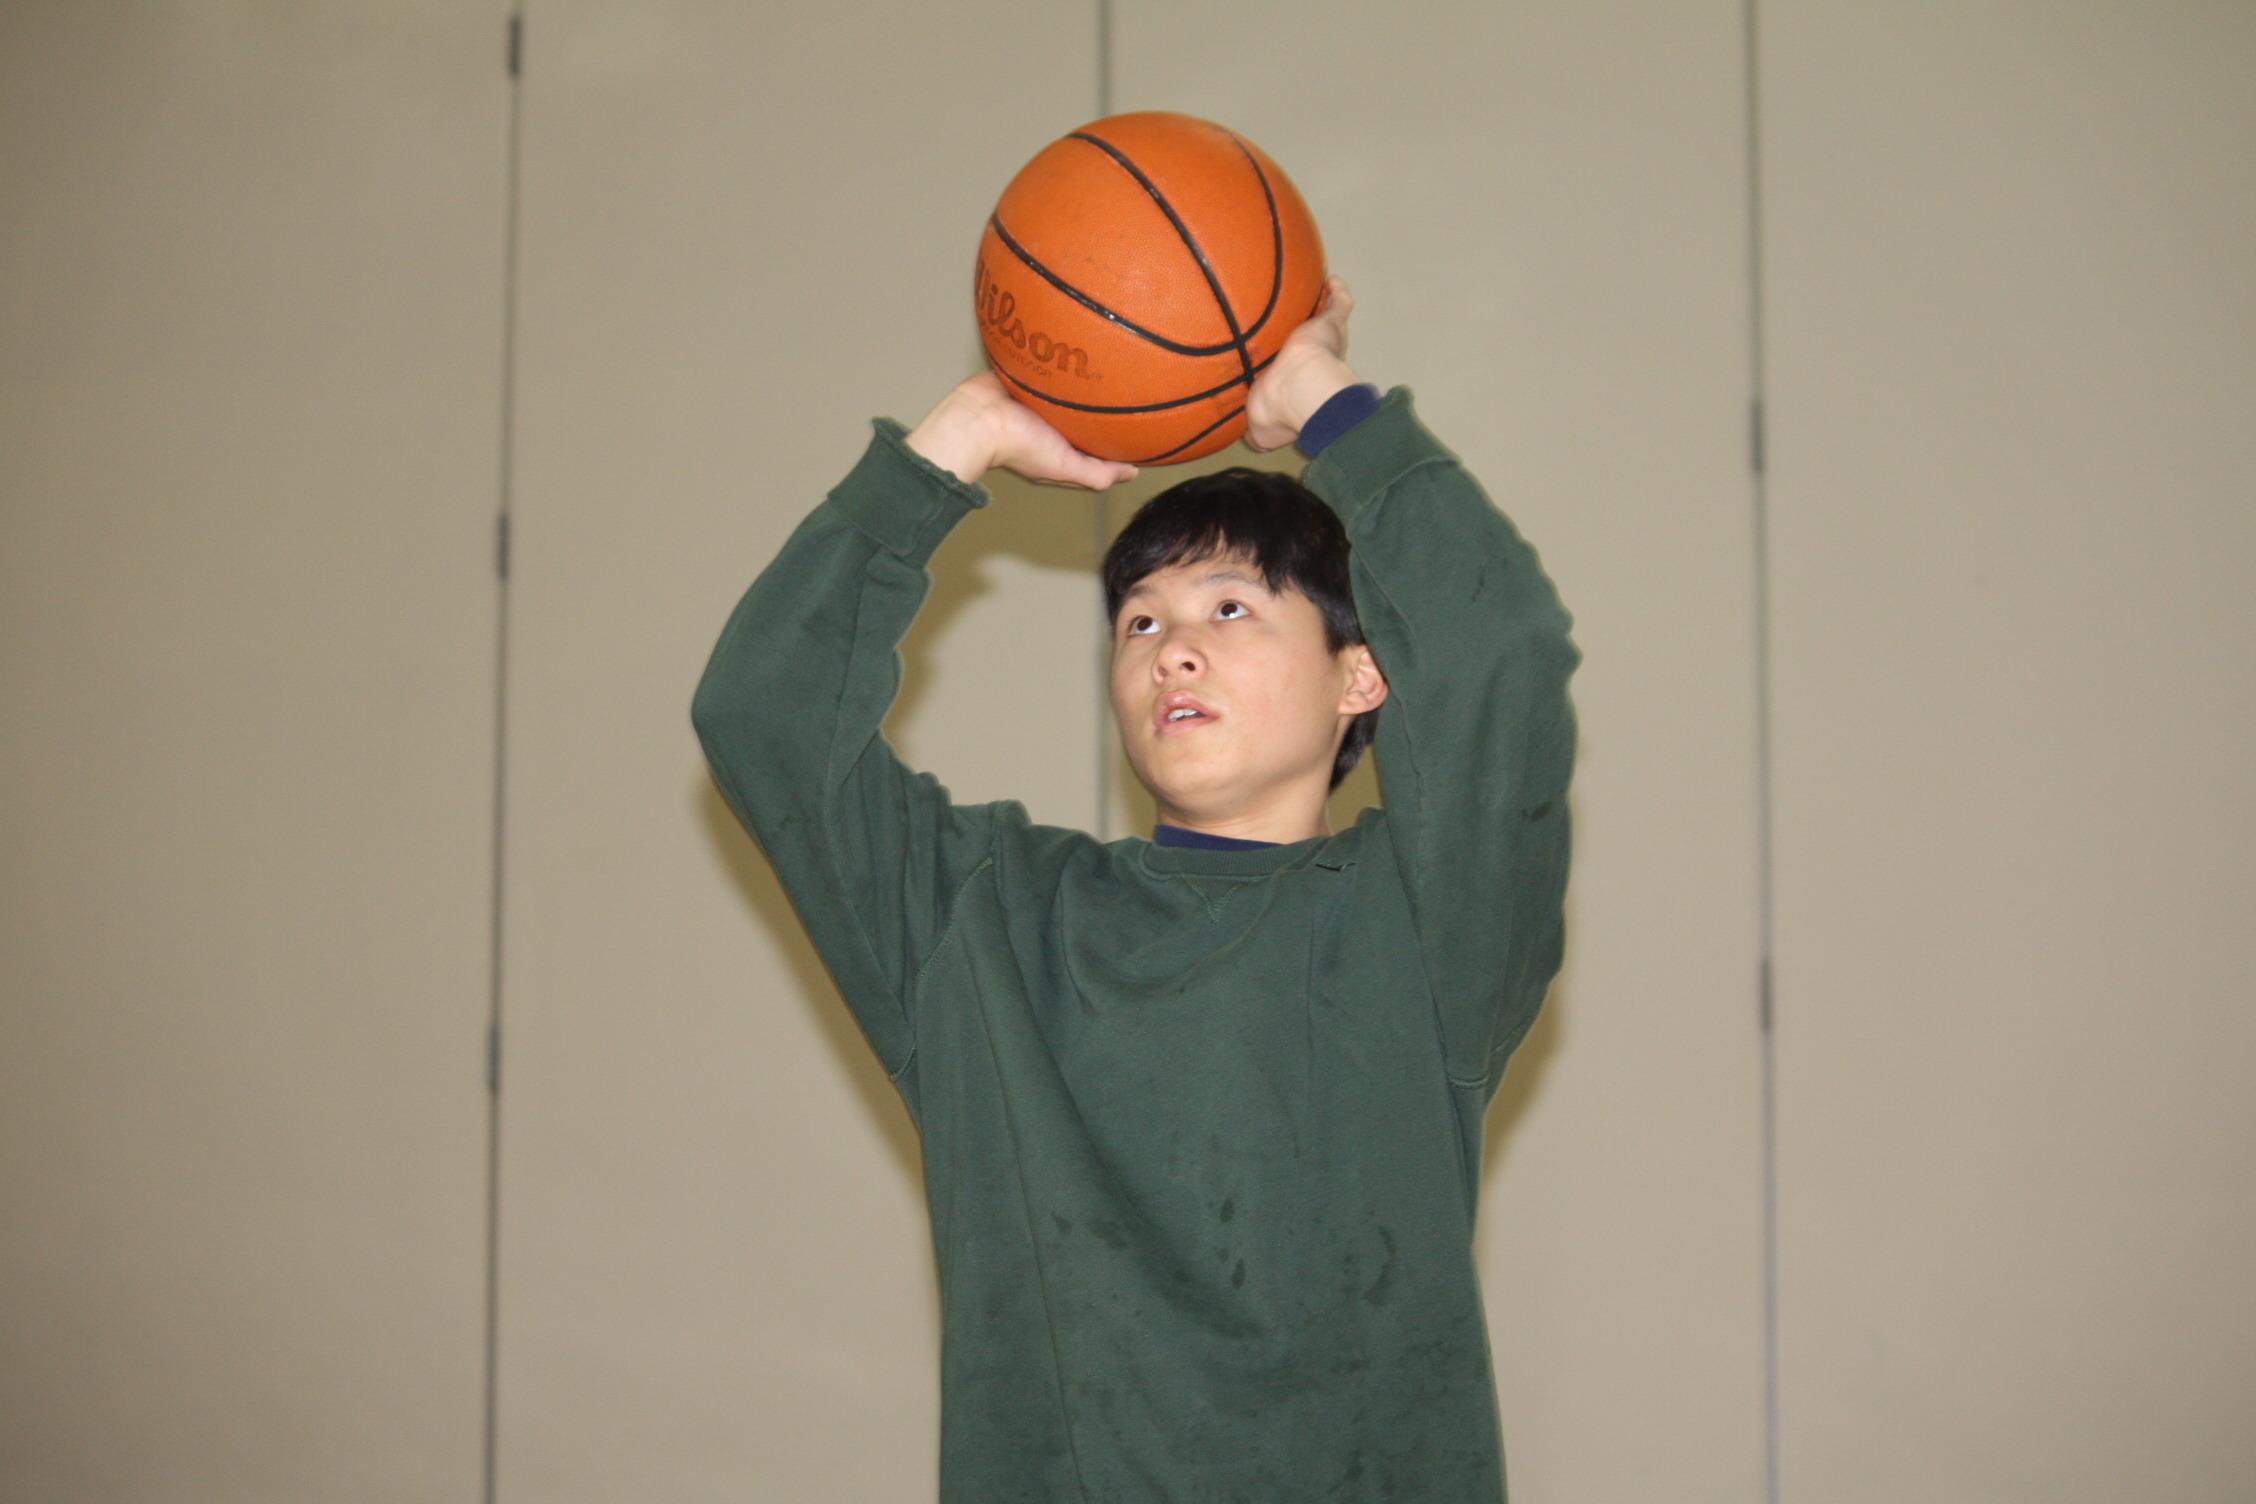 bb2fa569dc7184545c7b_LACD_Basketball_041.JPG